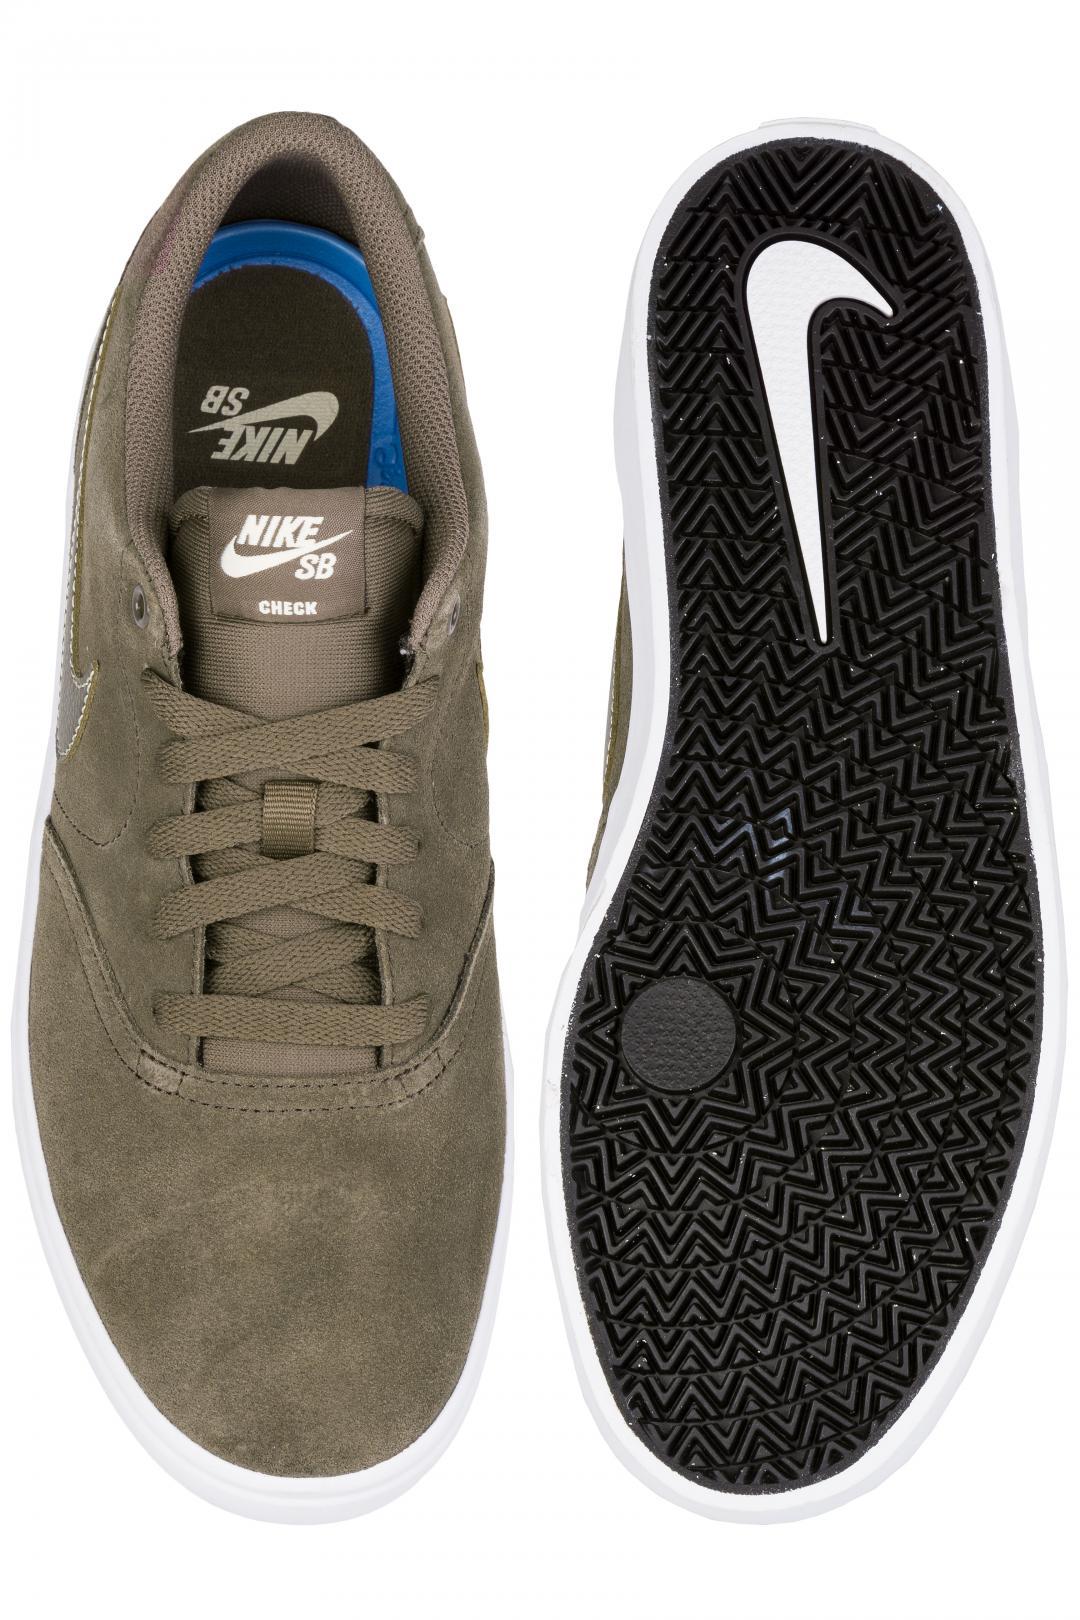 Uomo/Donna Nike SB Check Solarsoft ridgerock white fossil | Scarpe da skate